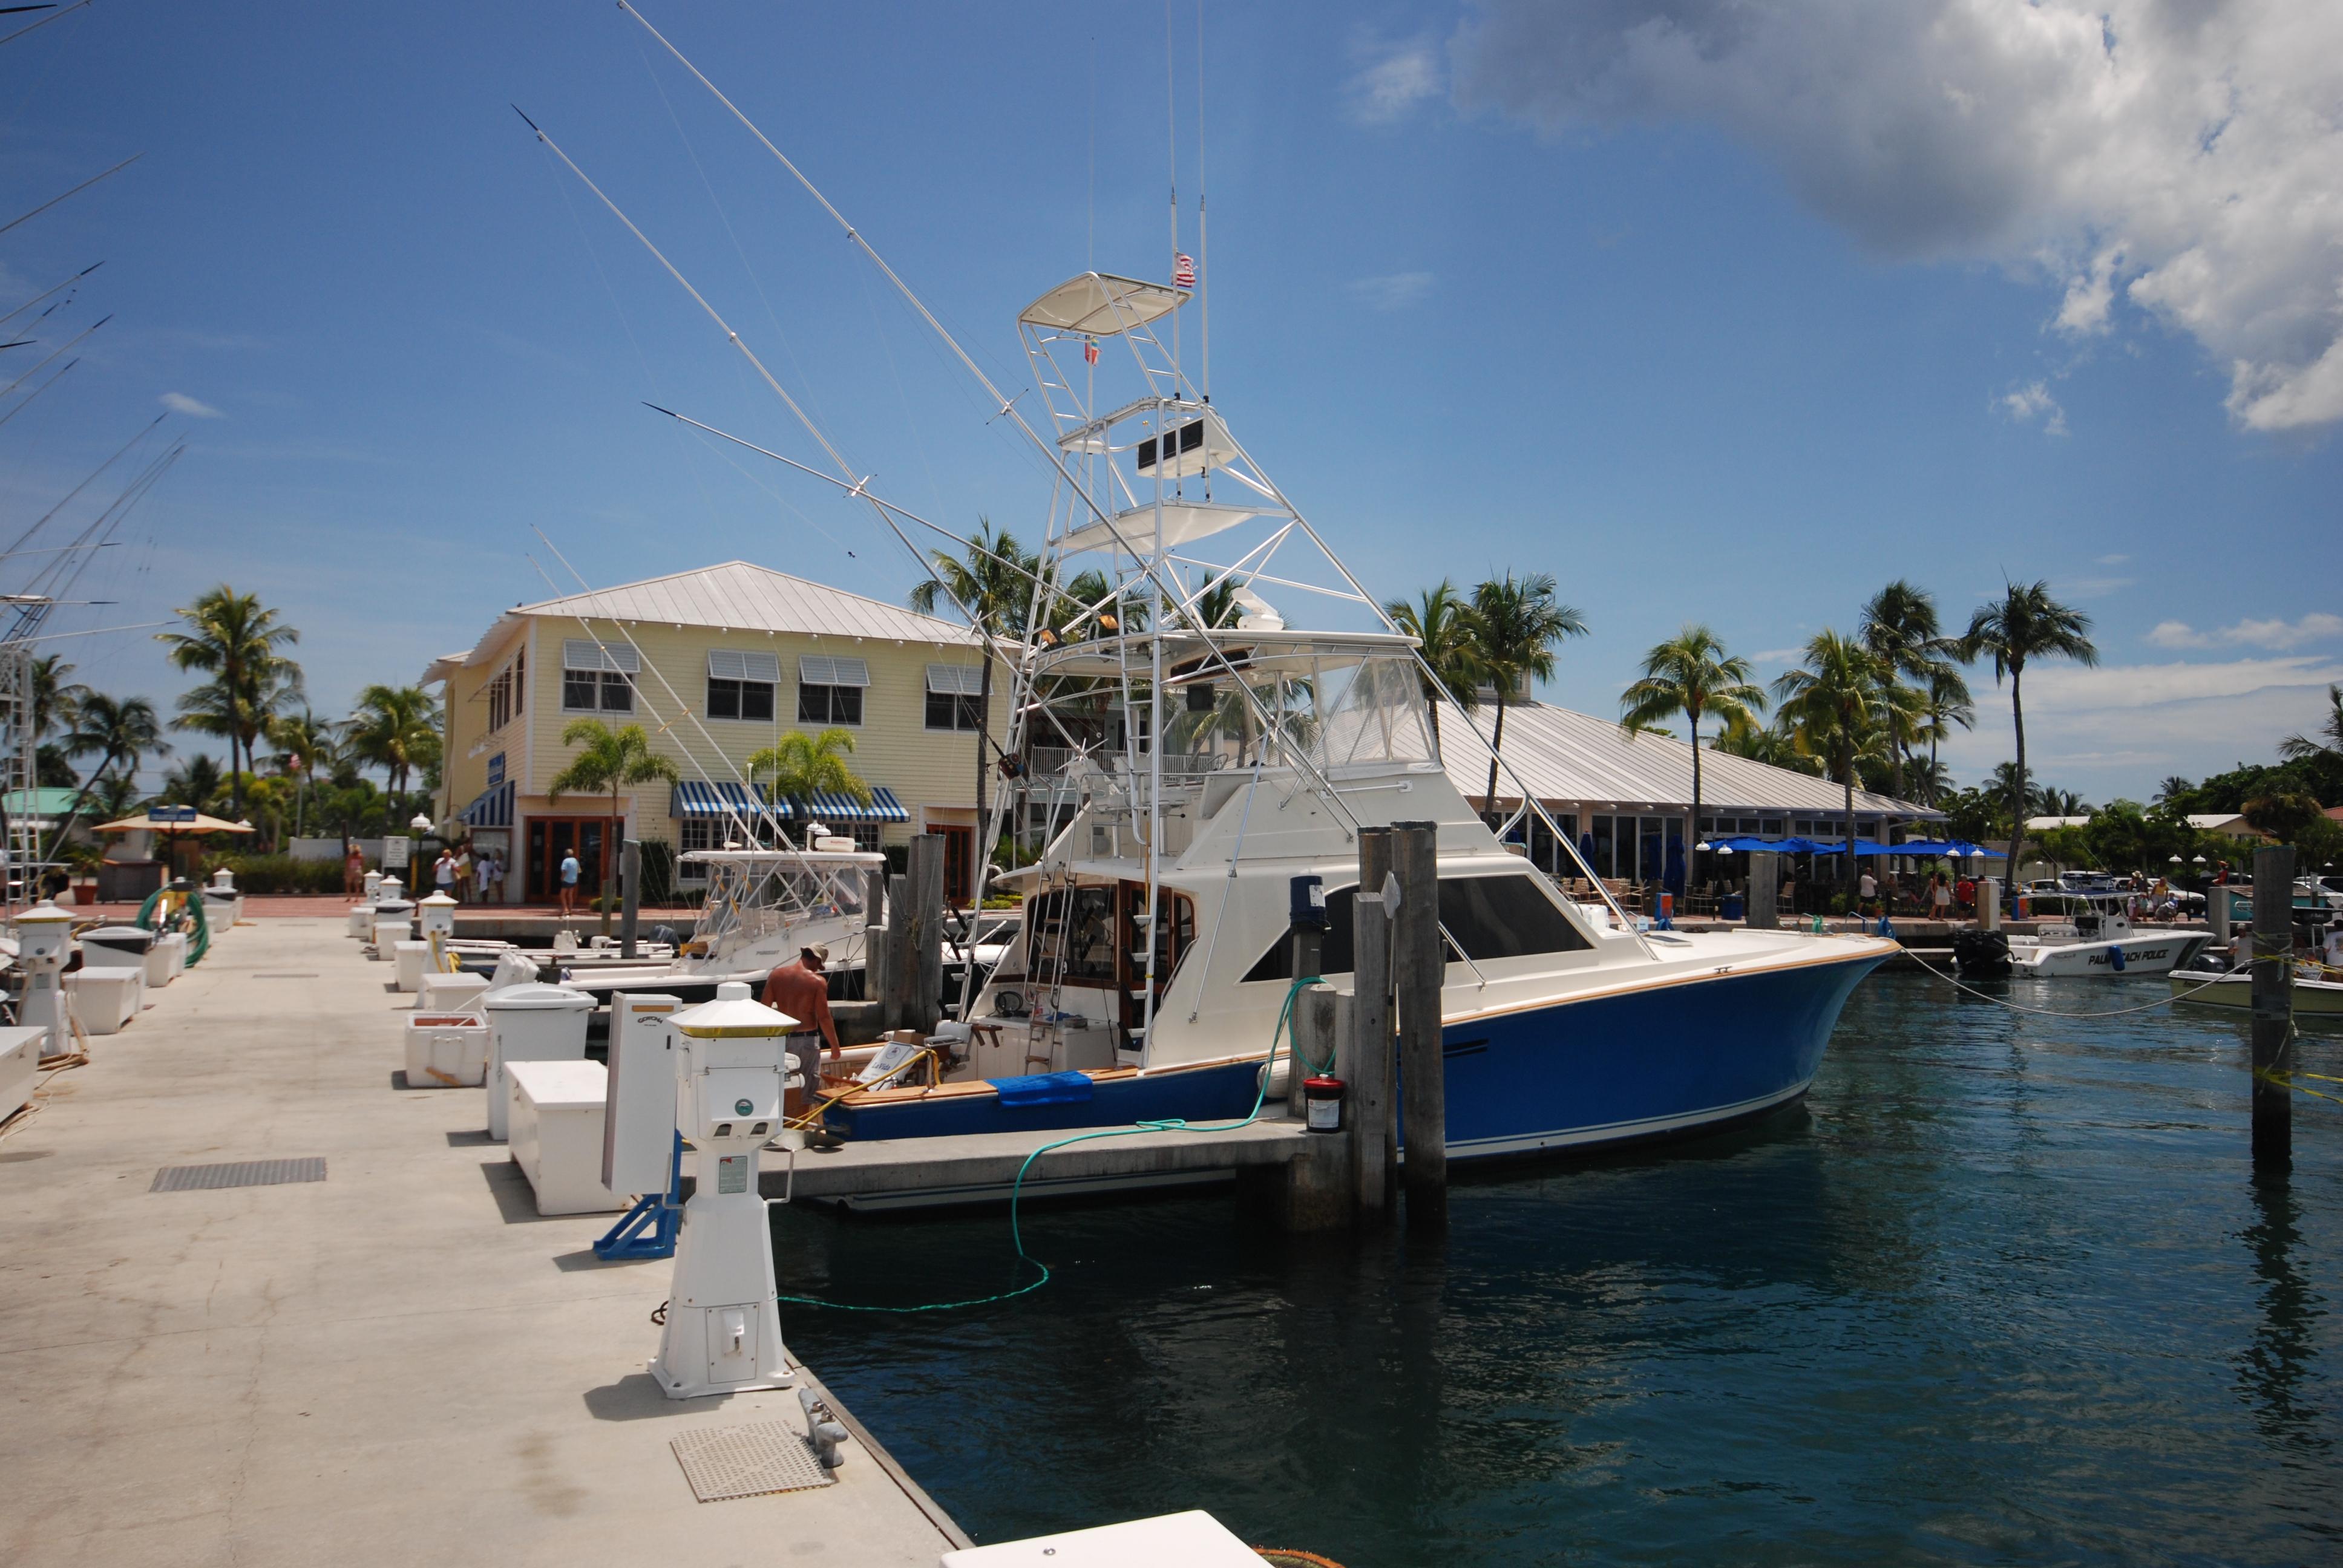 Sailfish marina looking to expand docks for Sailfish marina